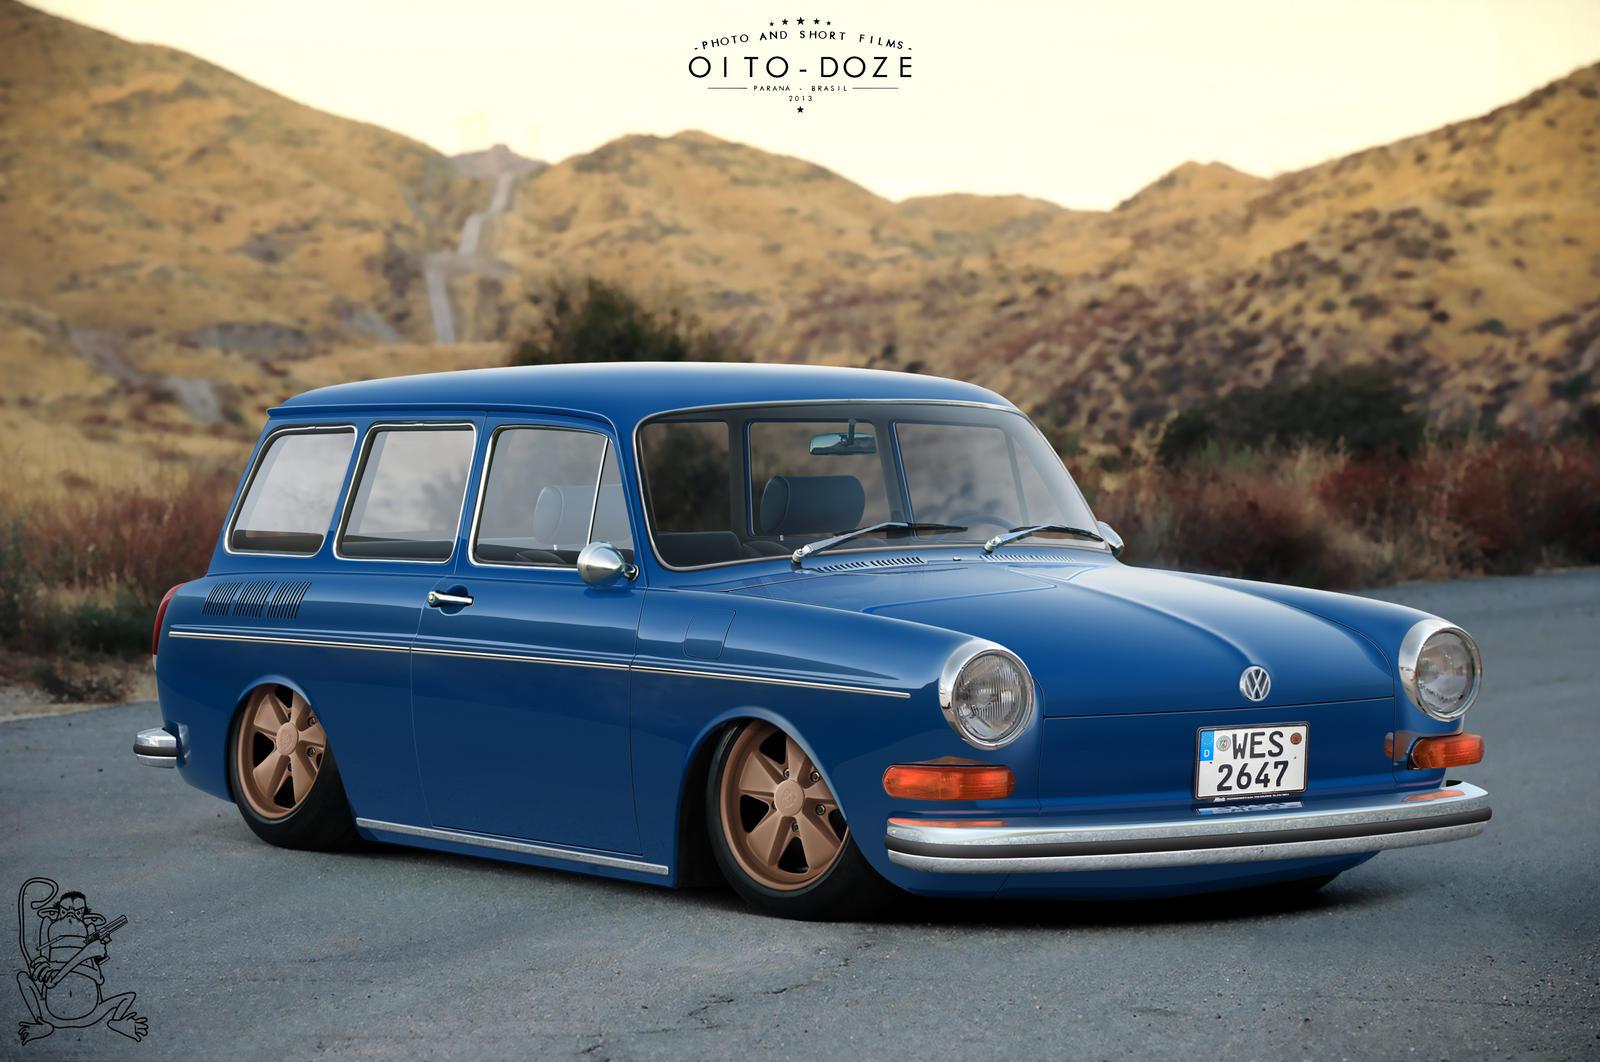 1968 Volkswagen Type 3 Squareback: Volkswagen Type 3 Squareback By ChitaDesigner On DeviantArt